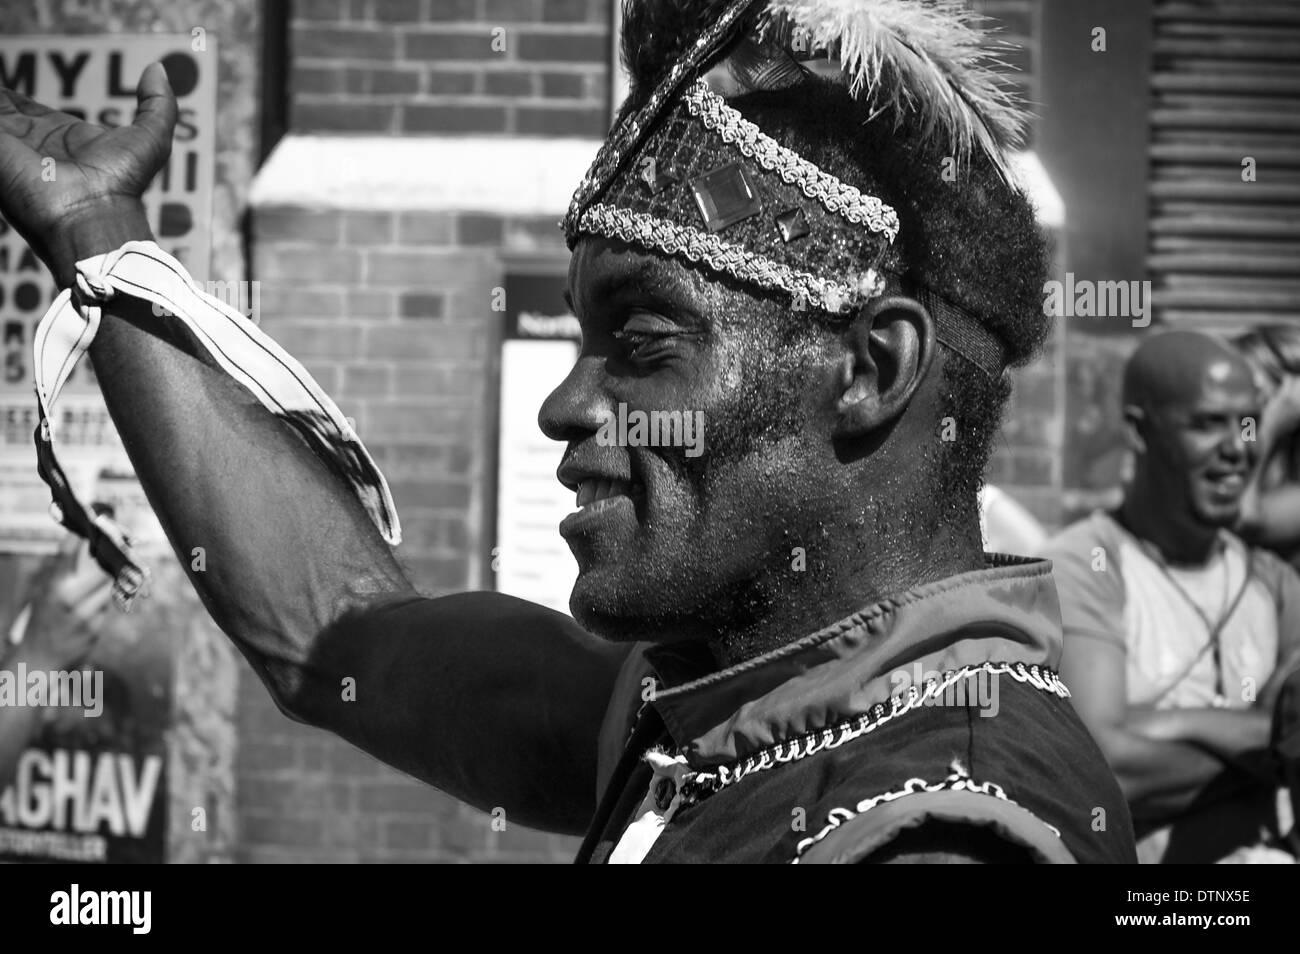 Notting Hill Carnival, London, UK - Stock Image